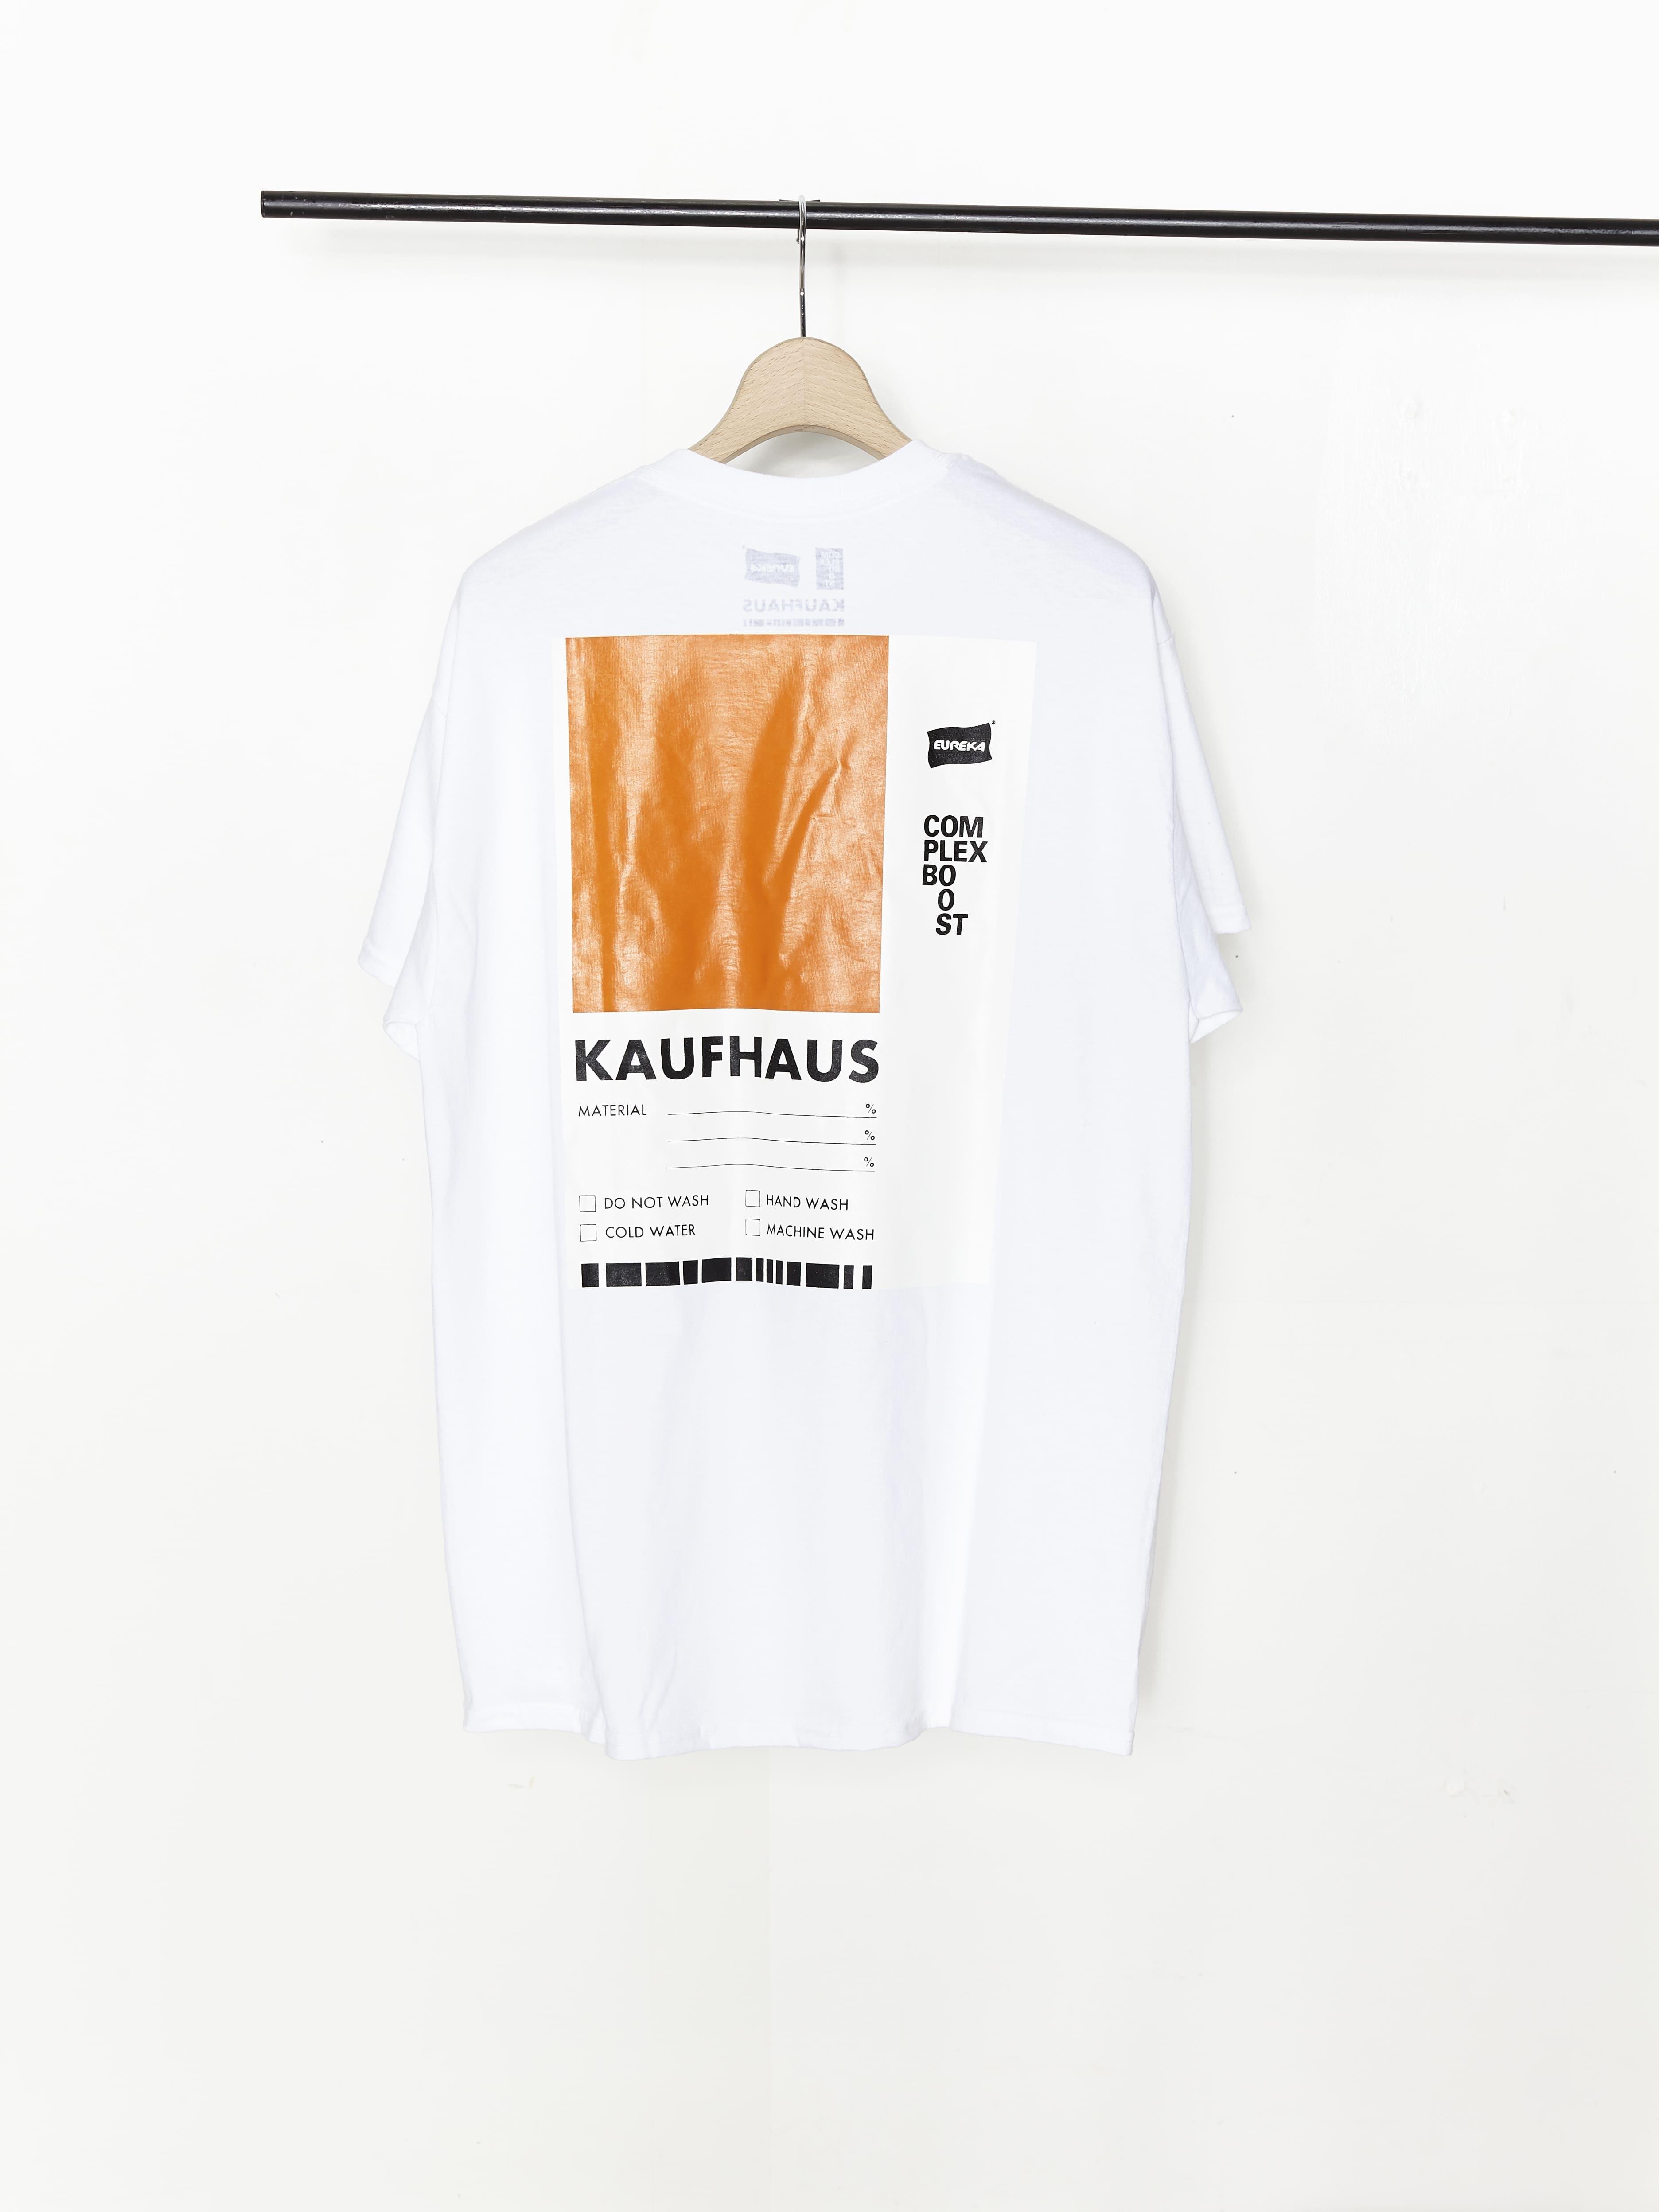 KAUFHAUS x COMPLEXBOOST SOUVENIR T-shirt